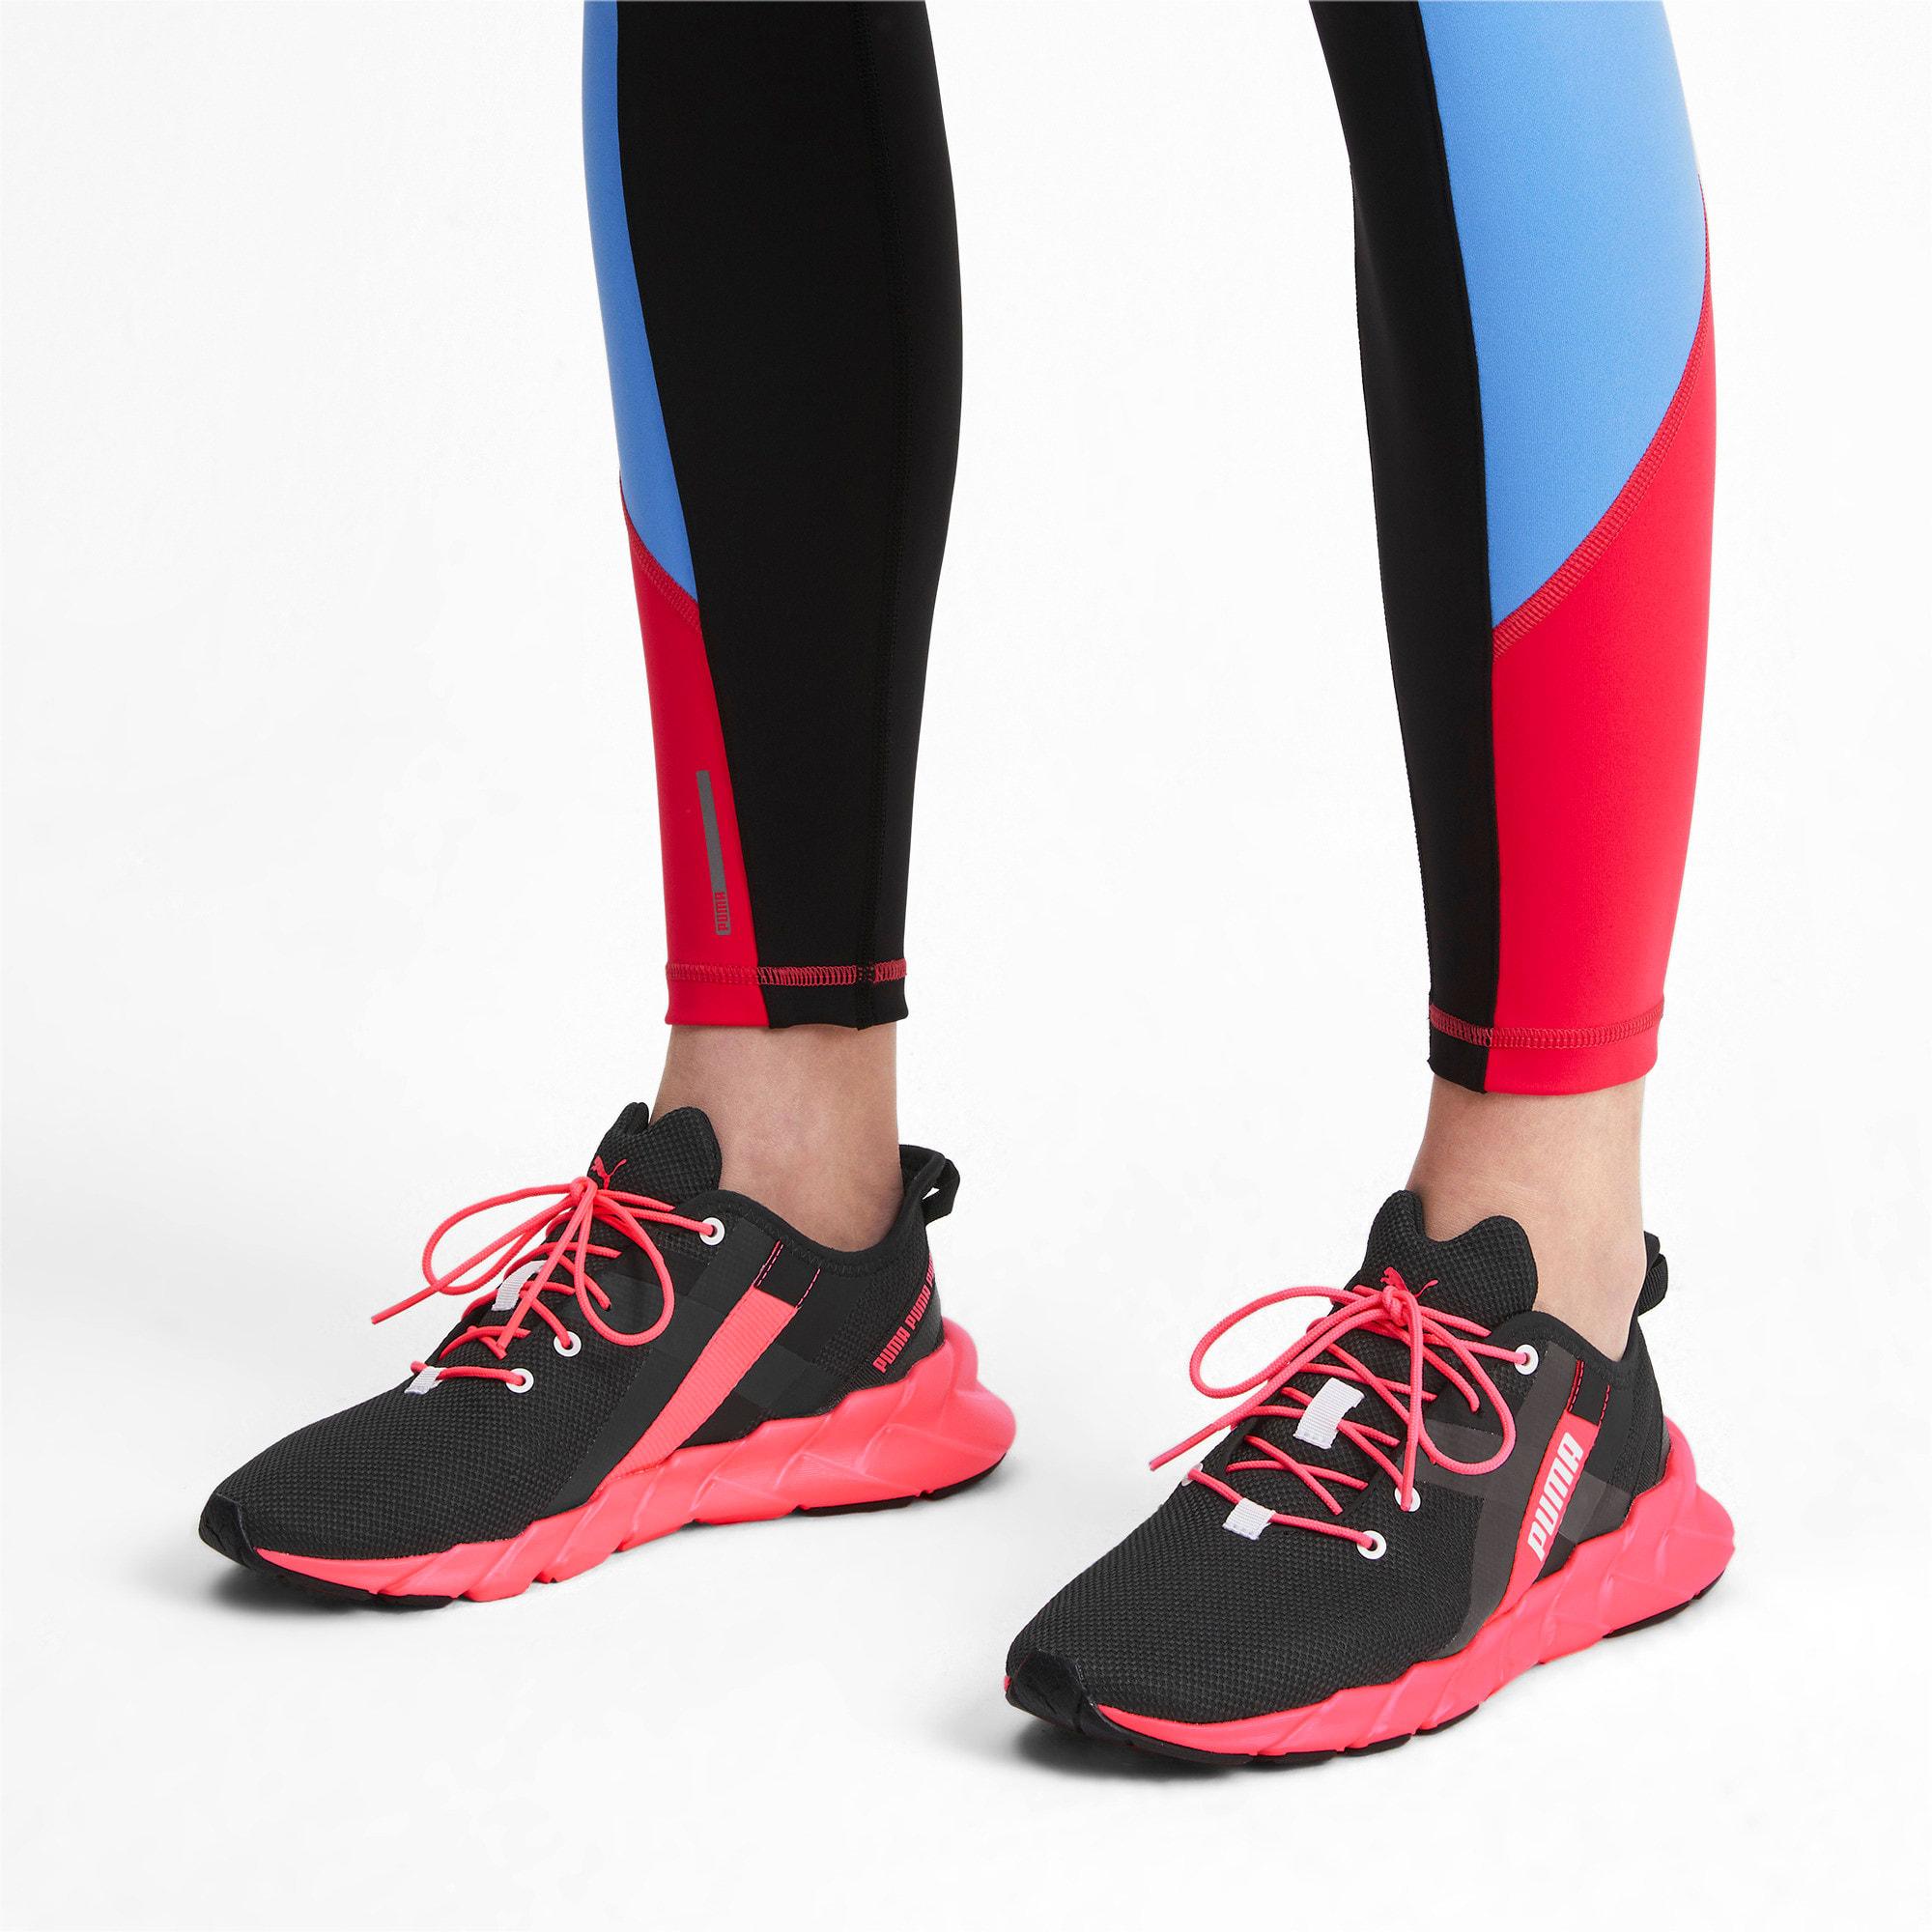 Thumbnail 2 of Weave XT Women's Training Shoes, Puma Black-Pink Alert, medium